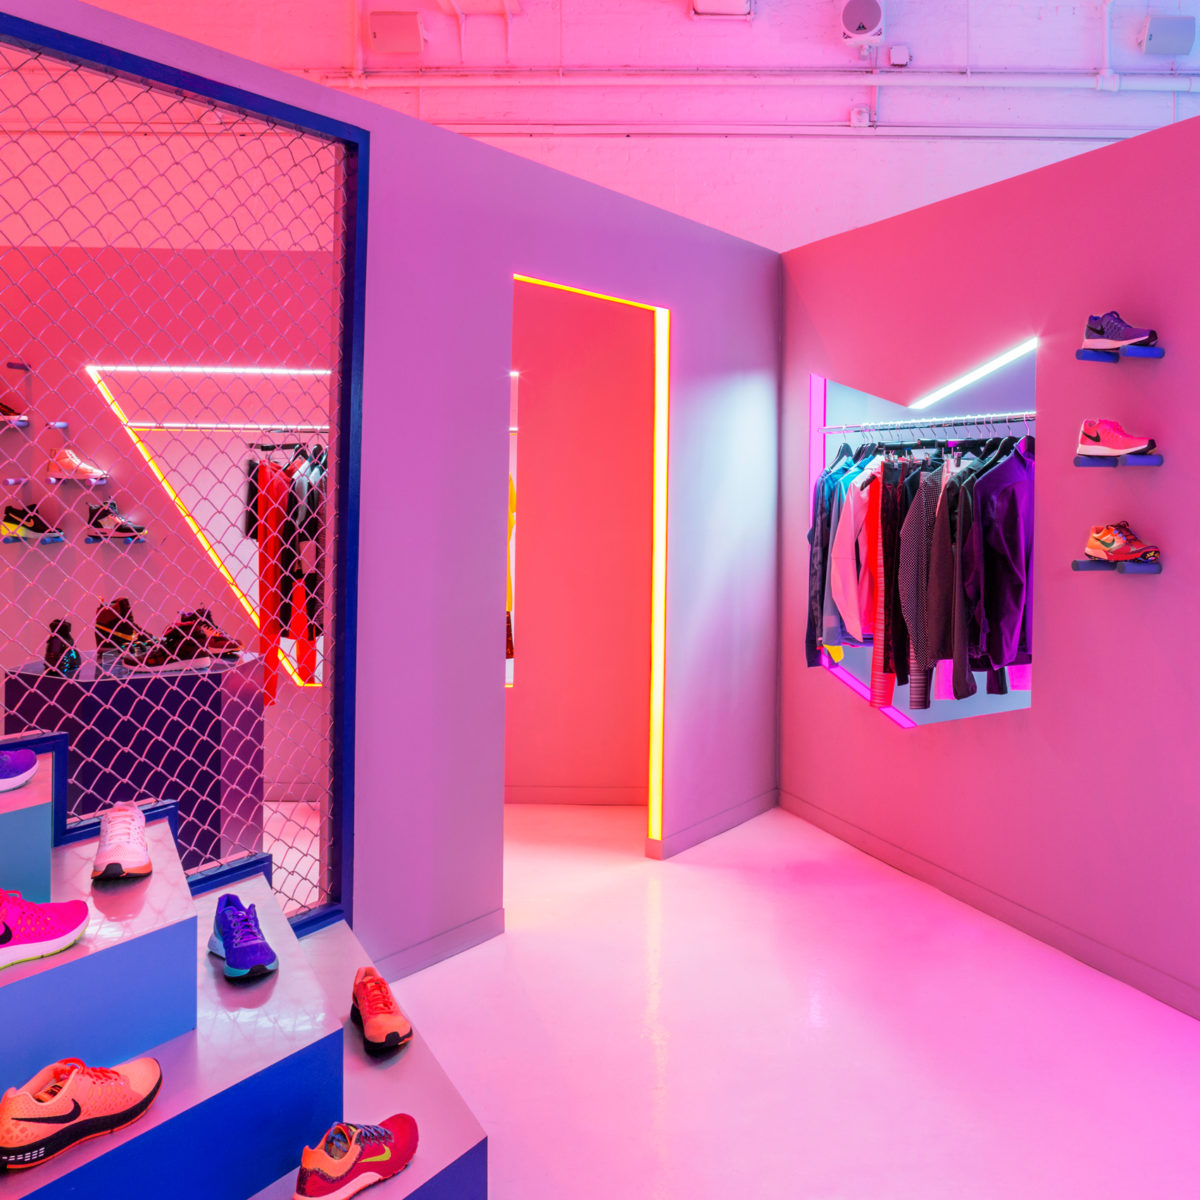 Pink Fever:從精品店到果汁店,10 個粉紅色室內設計打造充滿夢幻質感 9